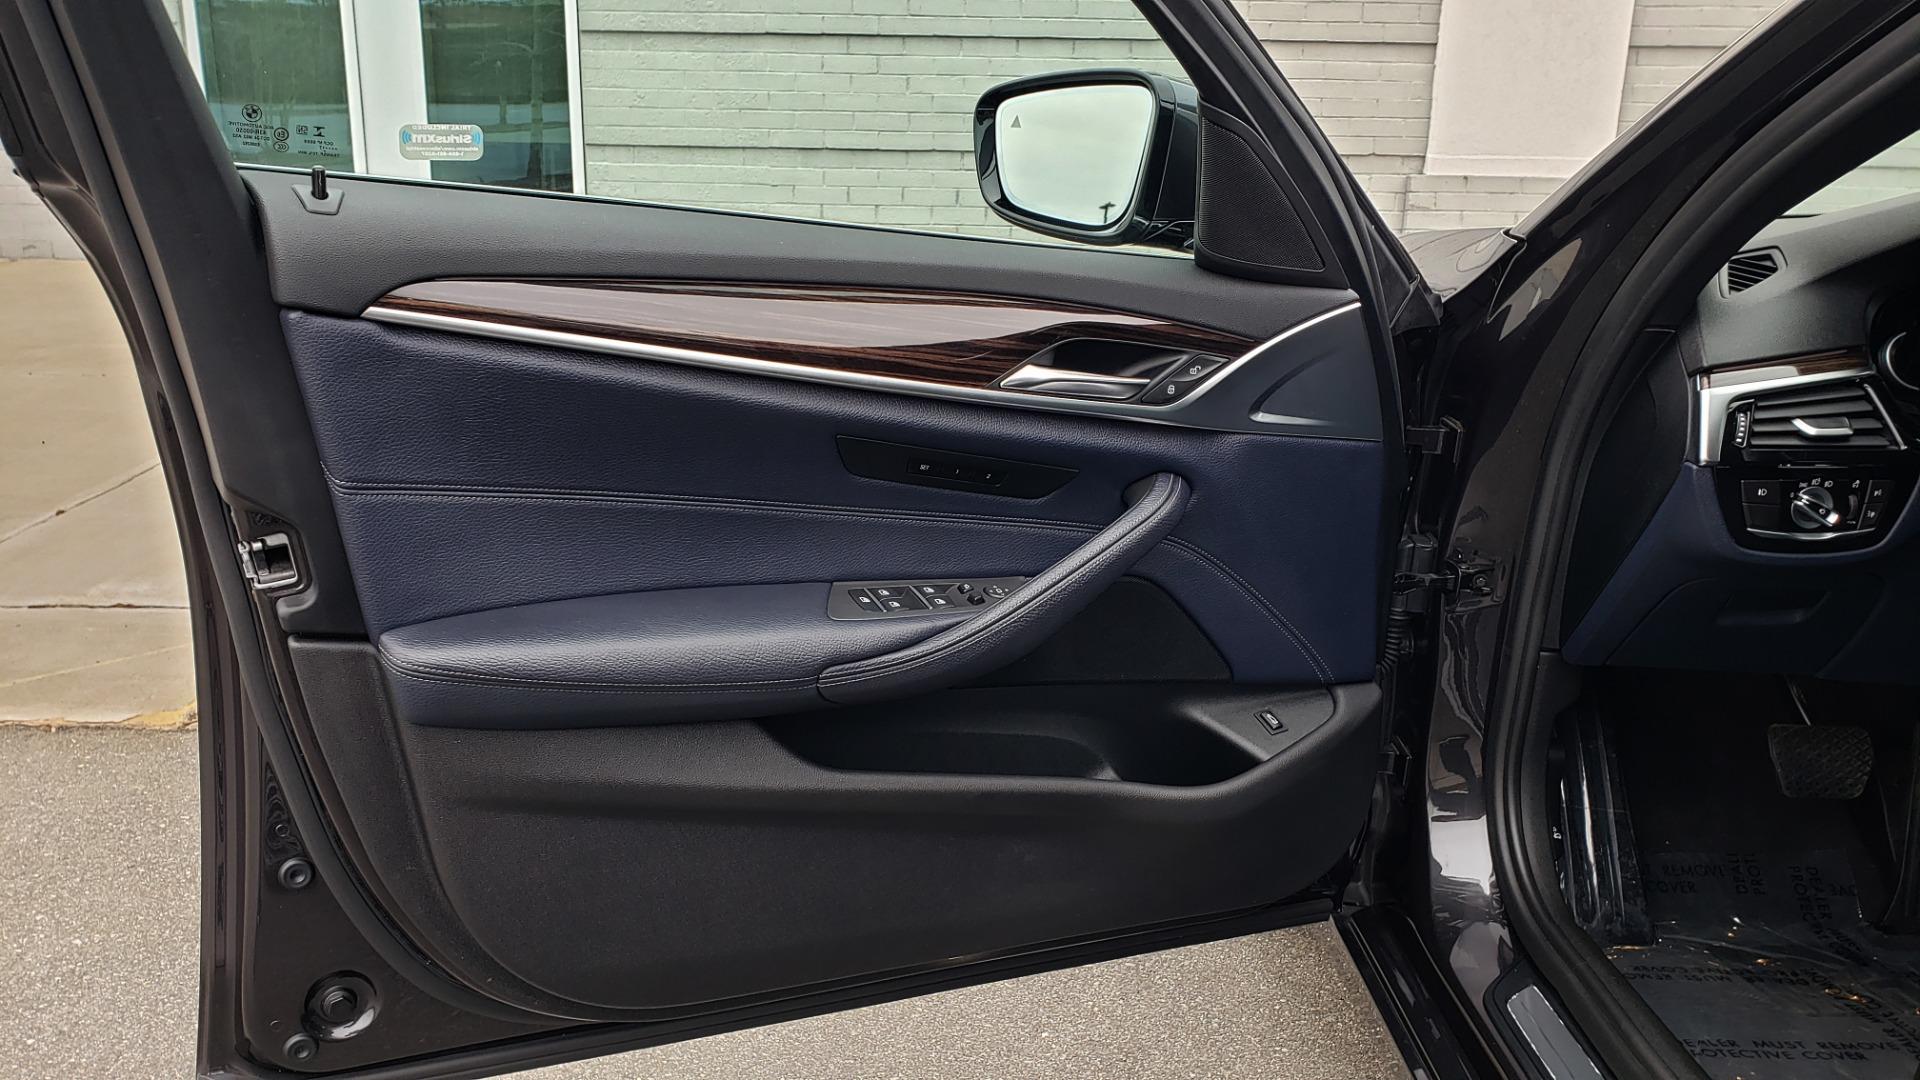 Used 2017 BMW 5 SERIES 530IXDRIVE / PREM PKG / DRVR ASST PLUS / CLD WTHR / APPLE CARPLAY for sale Sold at Formula Imports in Charlotte NC 28227 29